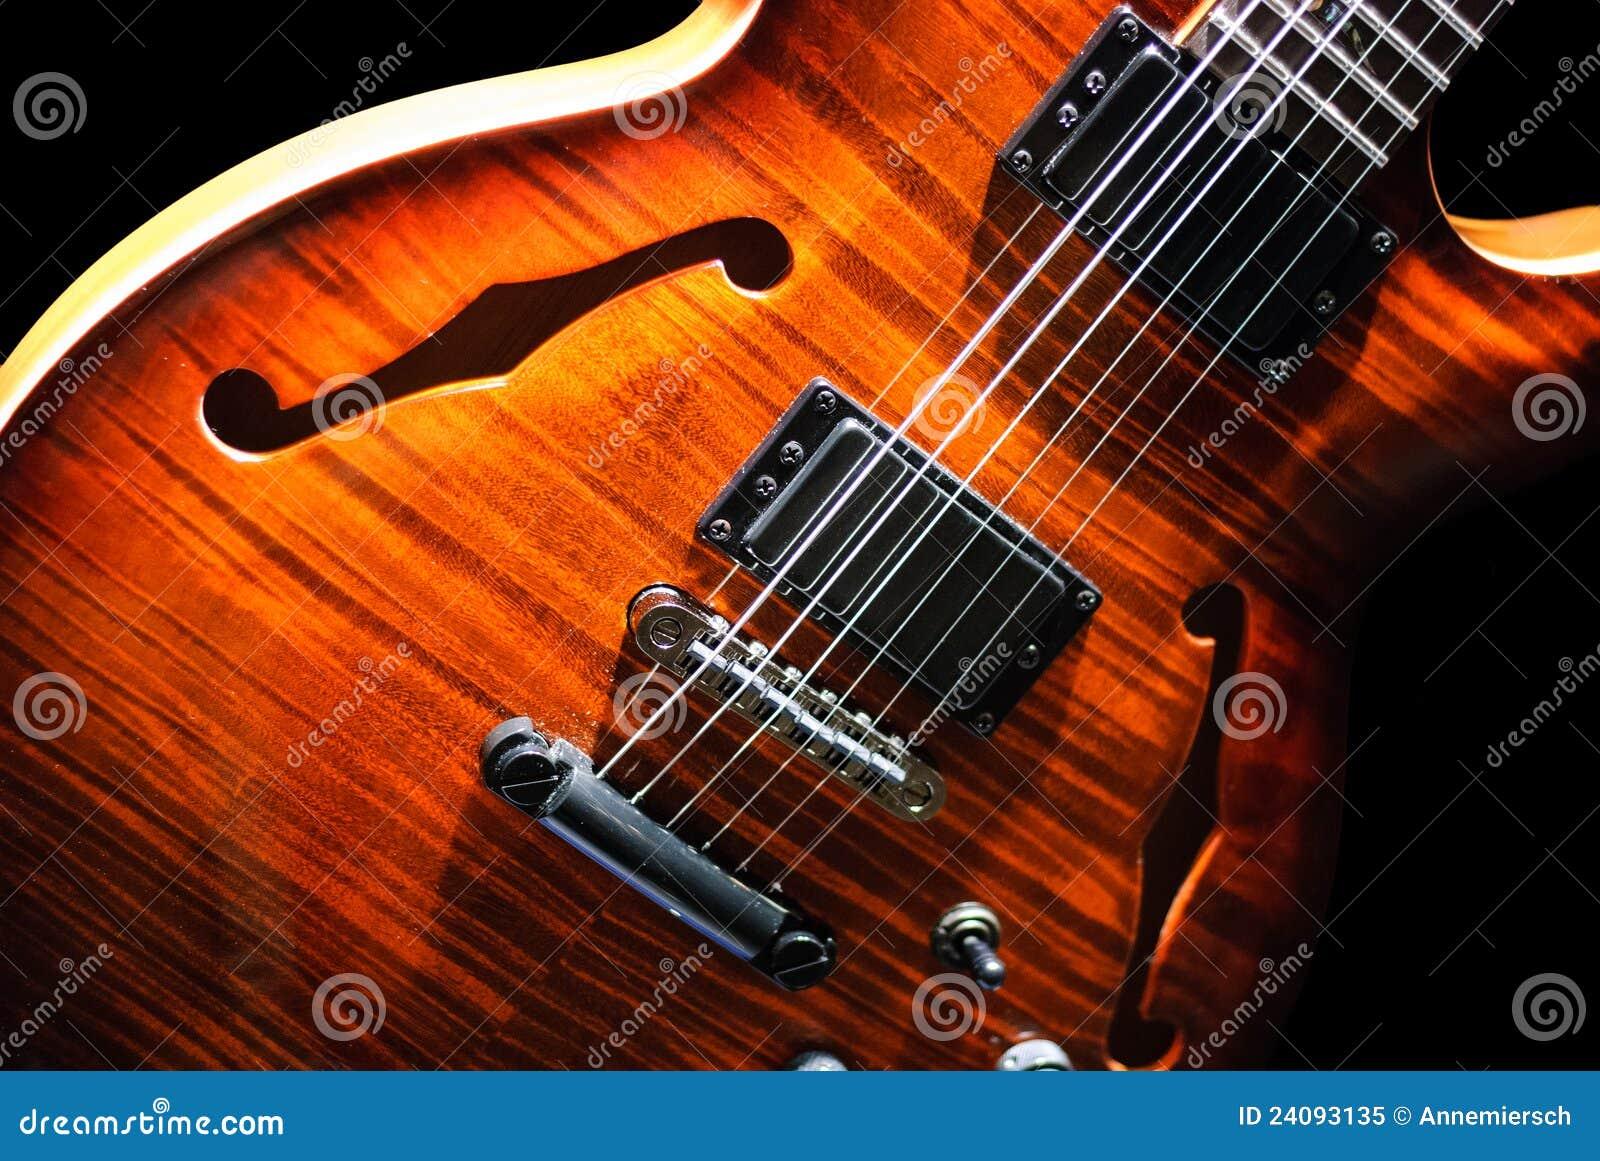 Blues guitar on black